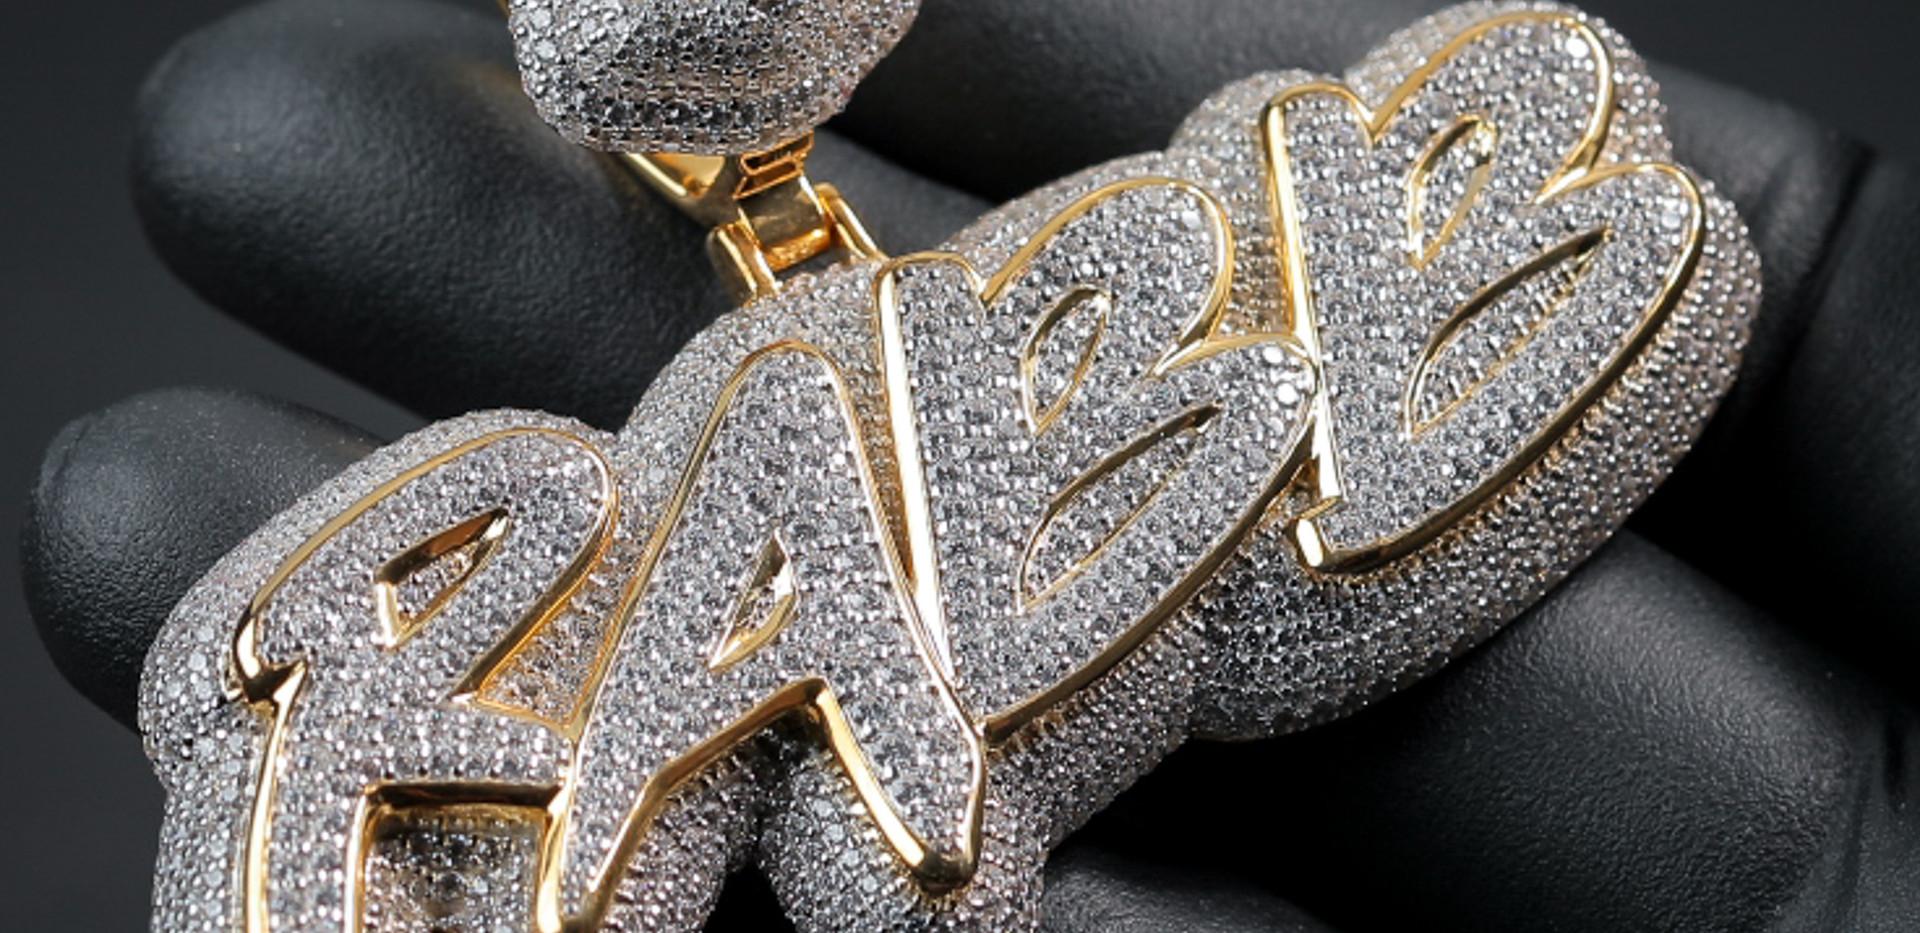 Raab Designed By. Tim Da Jeweler